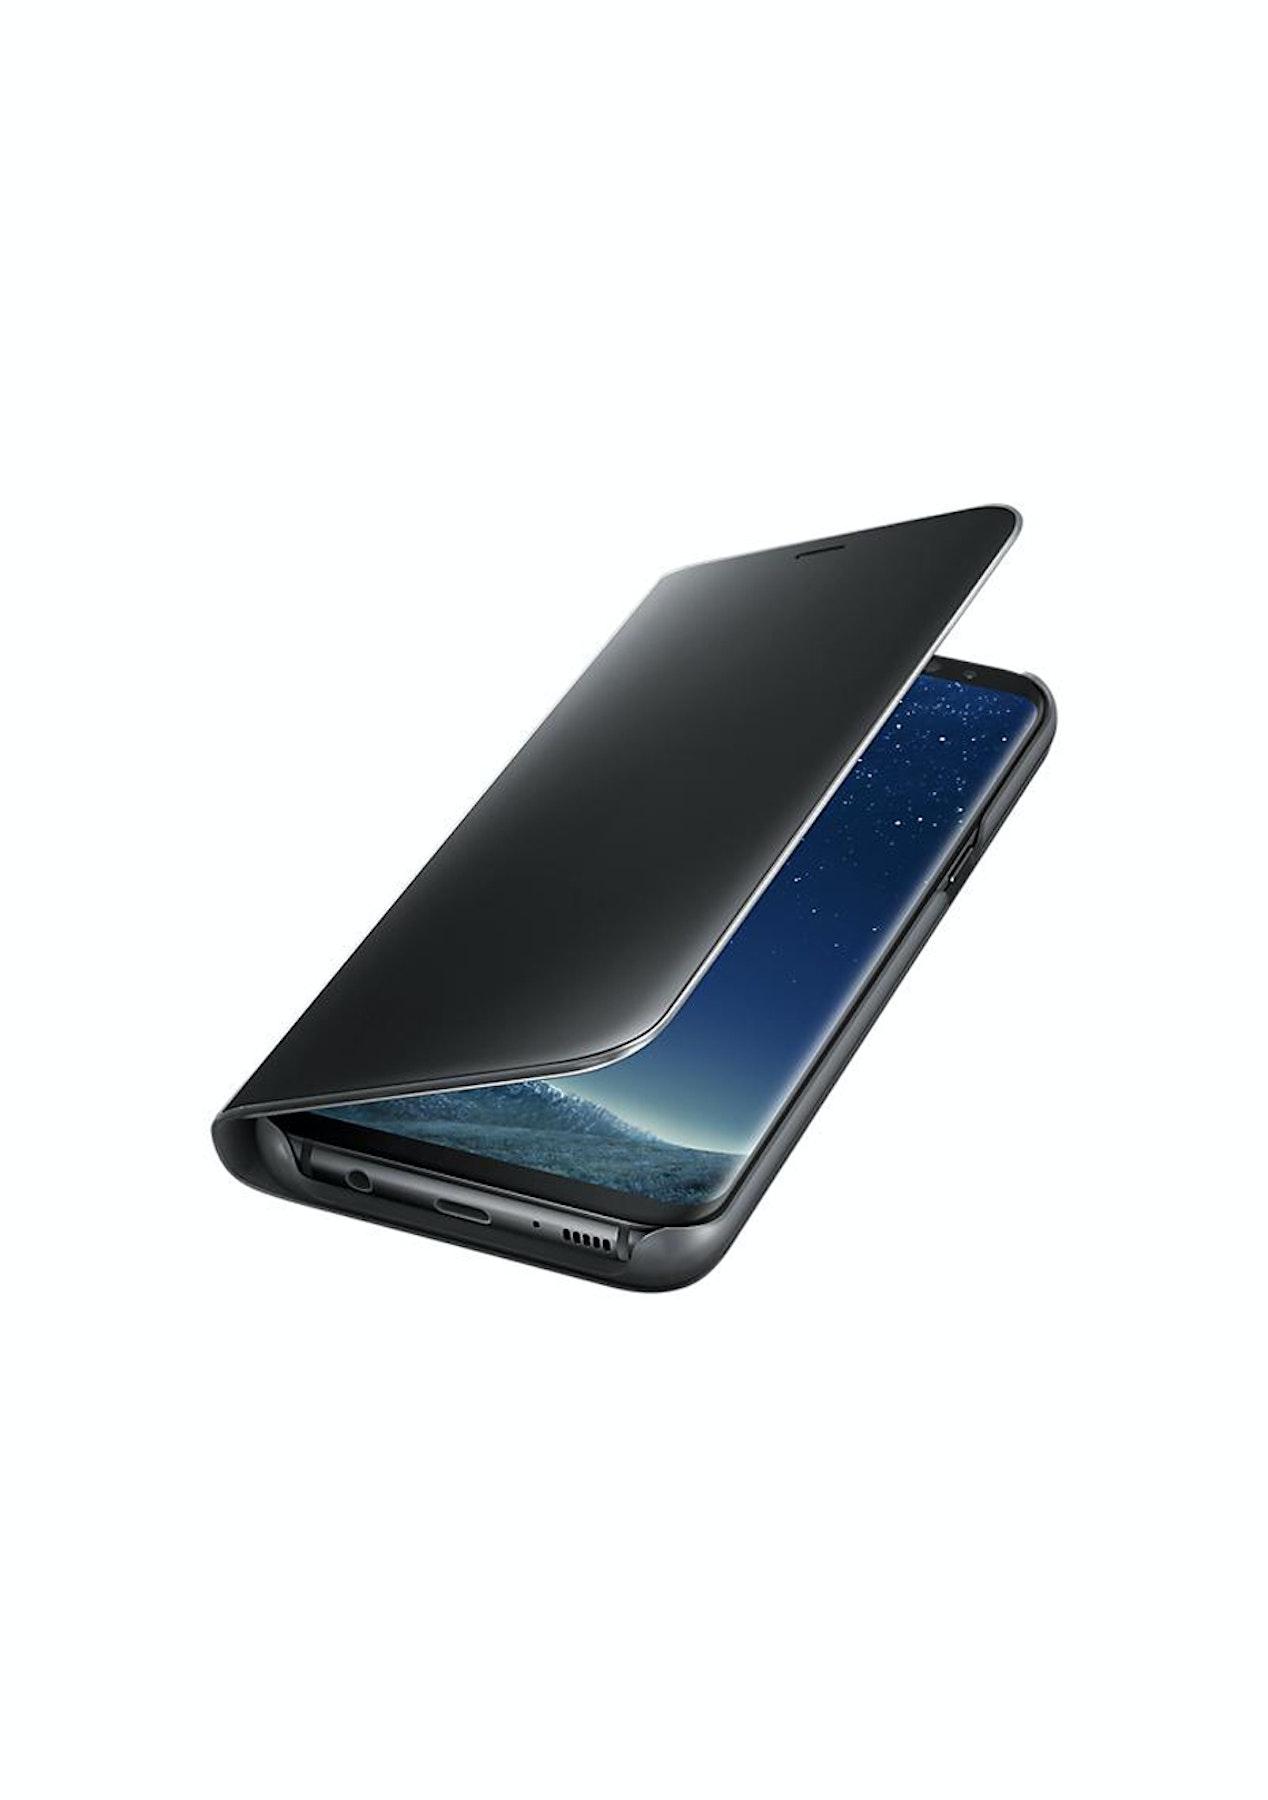 the latest e2217 5d1e4 Samsung Galaxy S8+ Clear View Stand Cover Case - Black